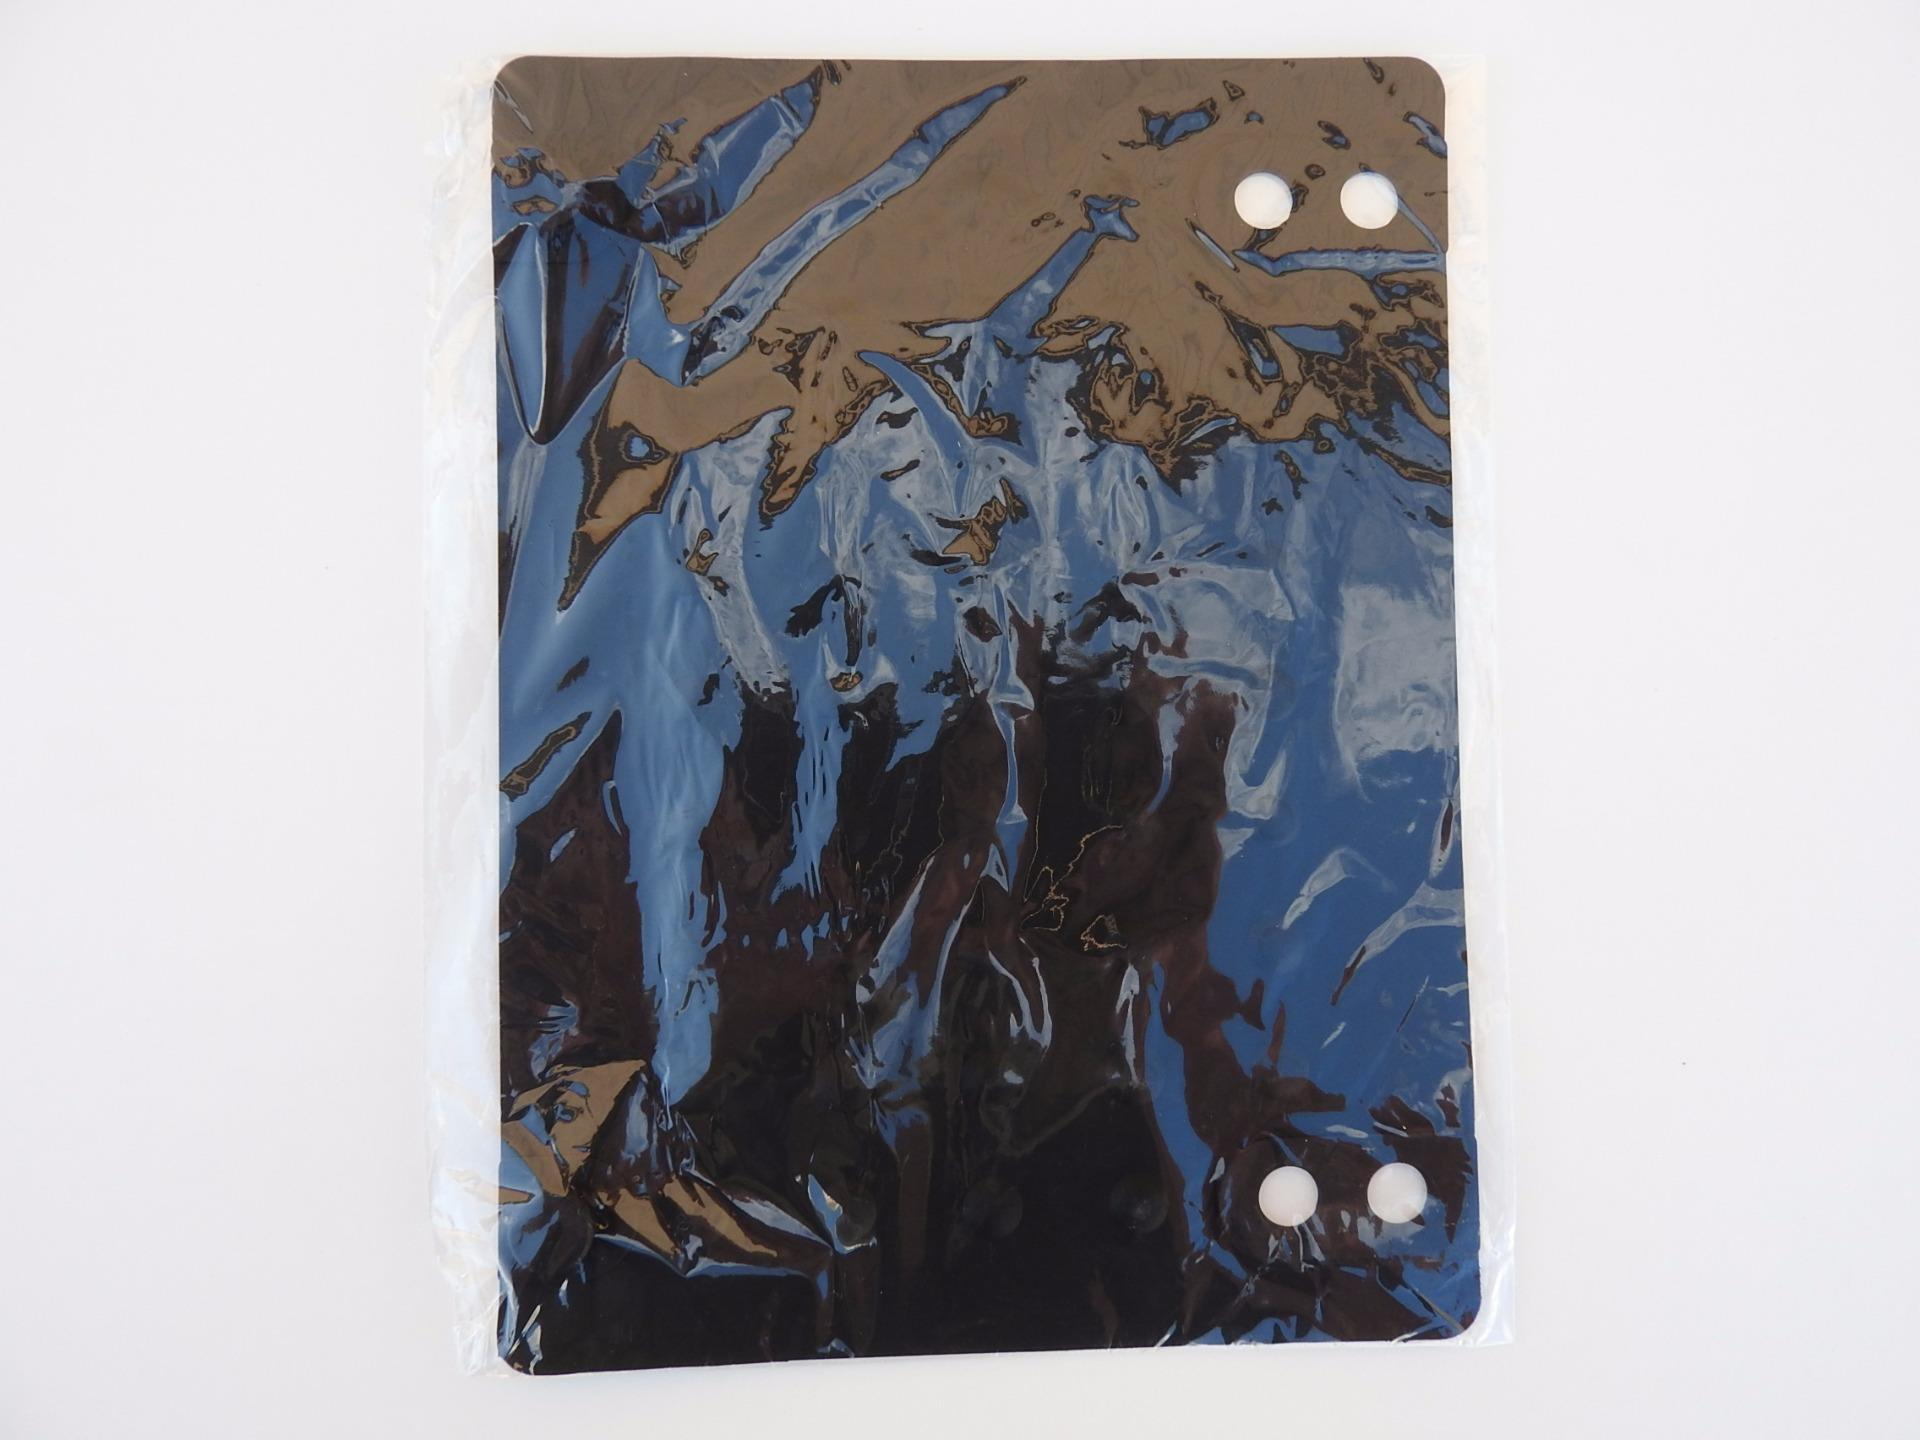 resistant mats samborubber pad i us midsizemark medium ding antislip mat heat en product detail multipurpose